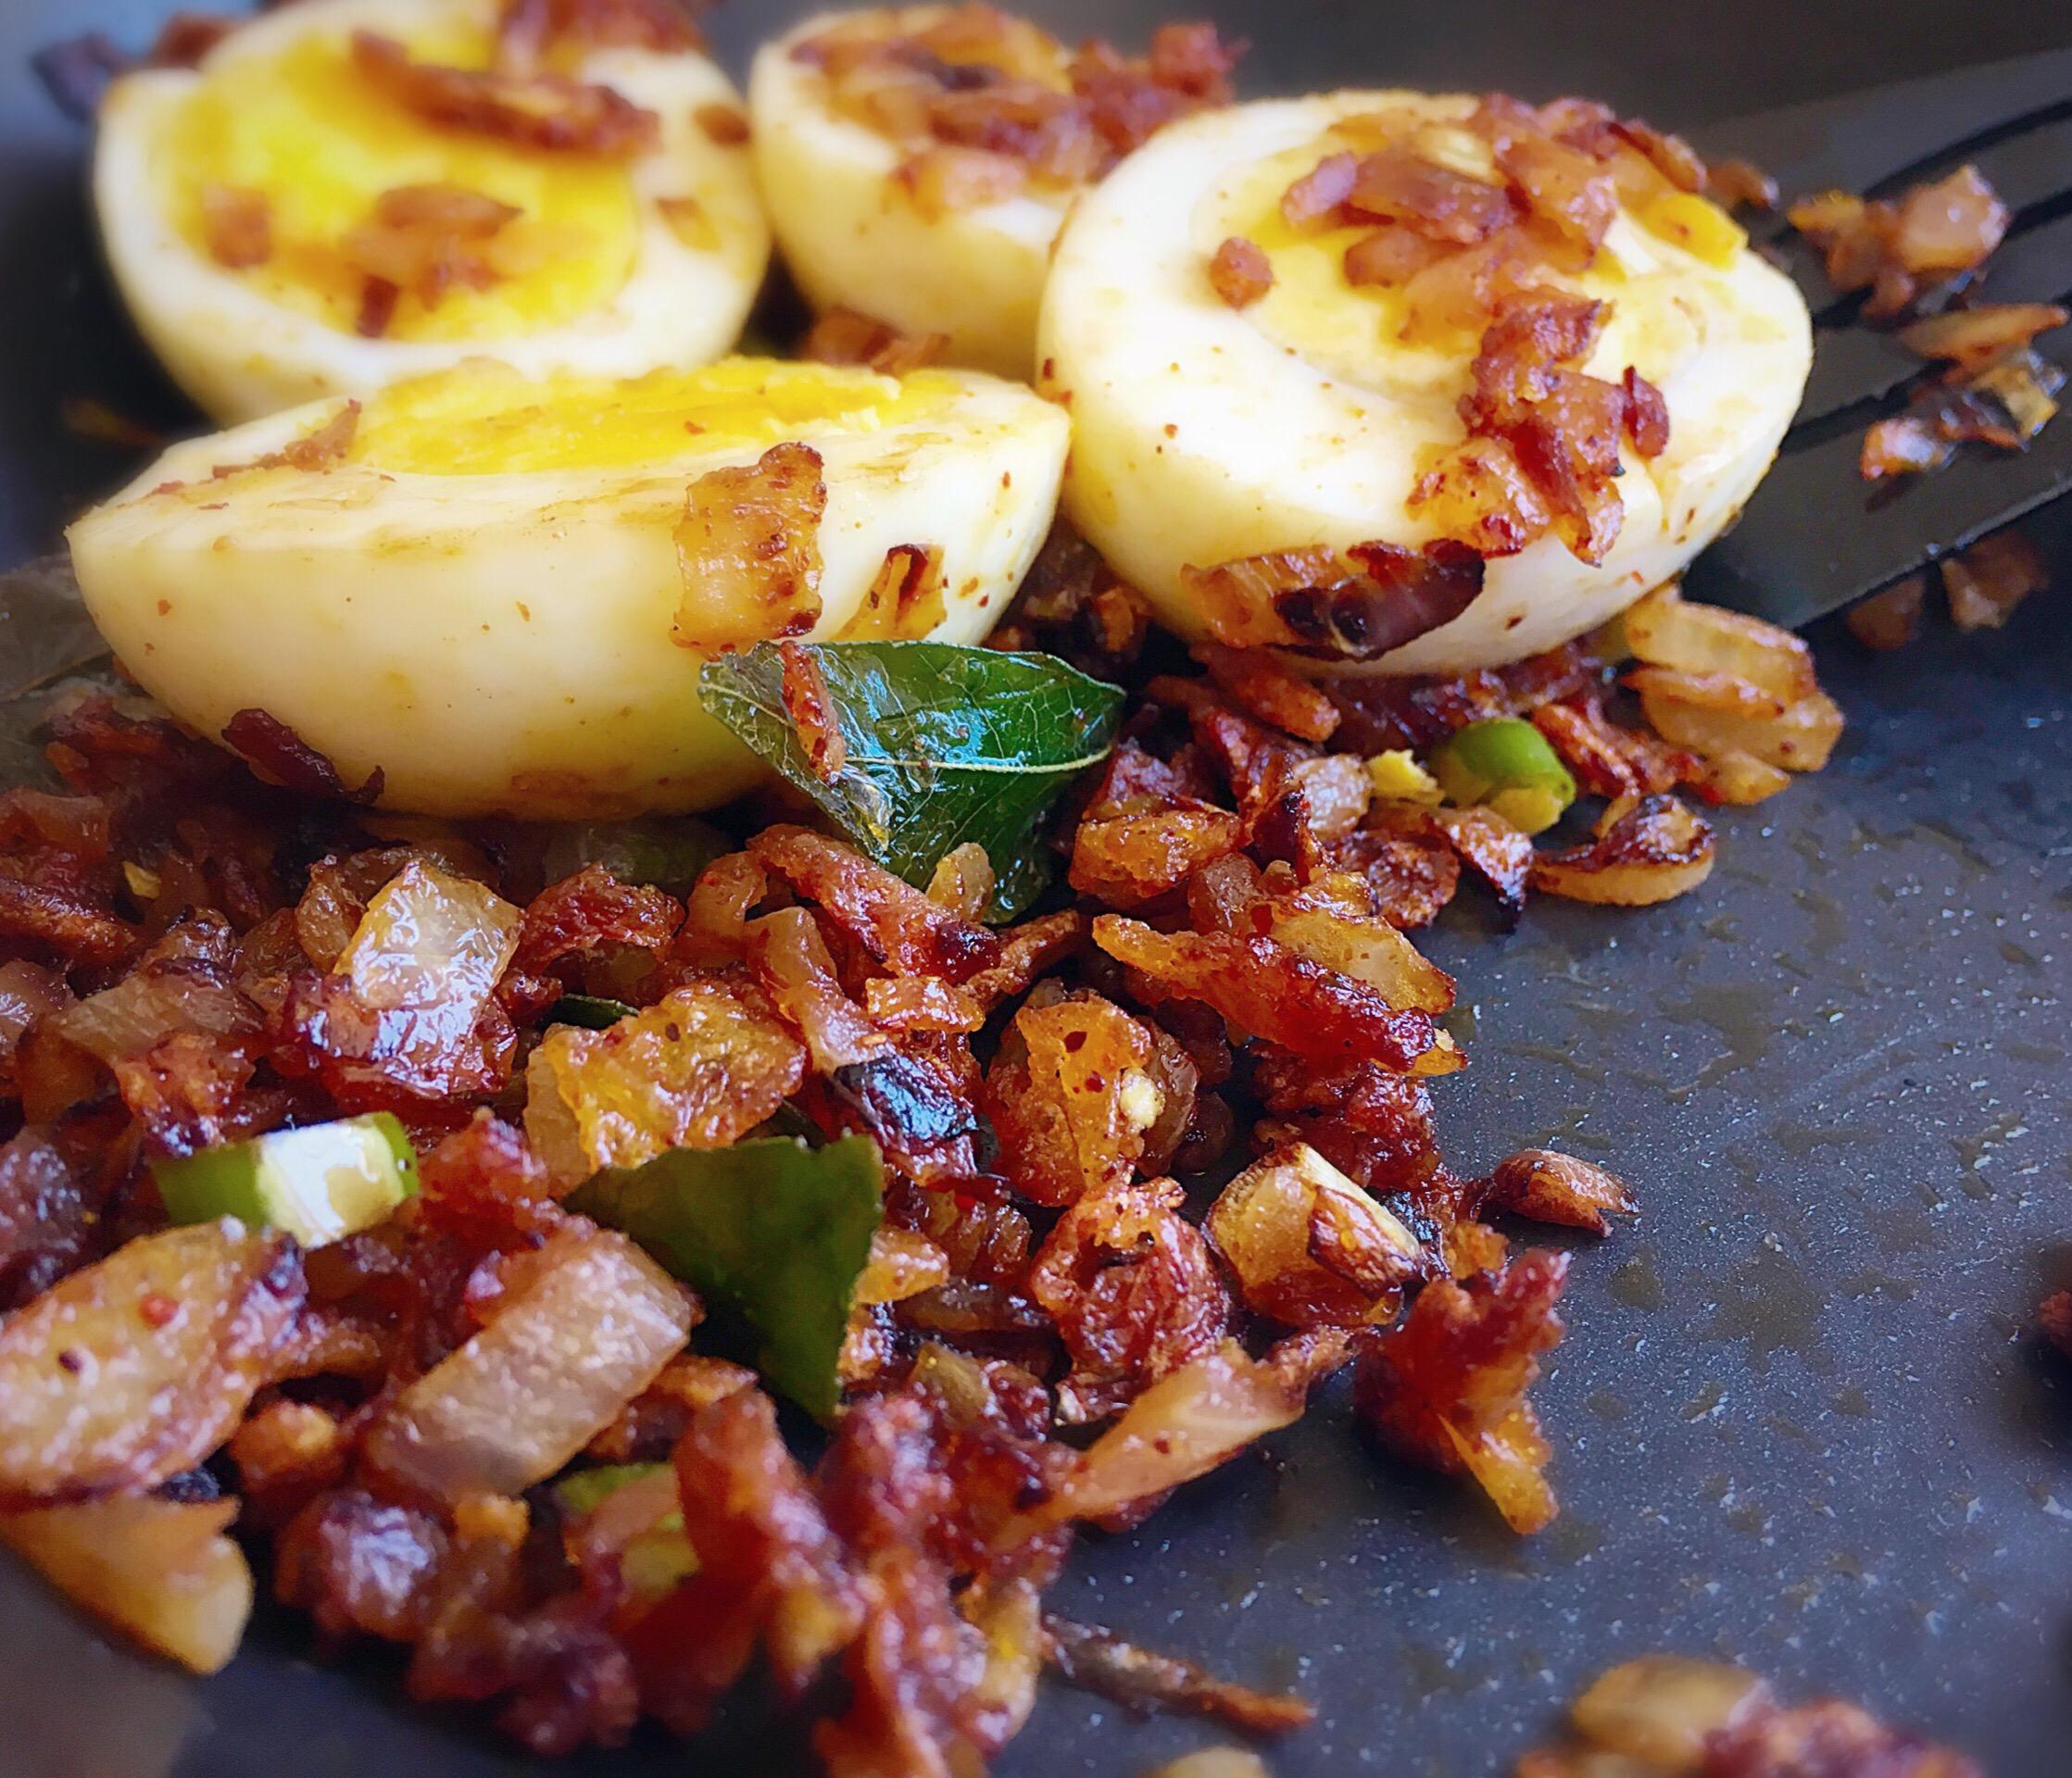 Egg fry, Egg vepudu, fry, egg, vepudu,egg masala,masala egg,egg curry,egg curry dry,egg onion fry,muttai fry,anda fry